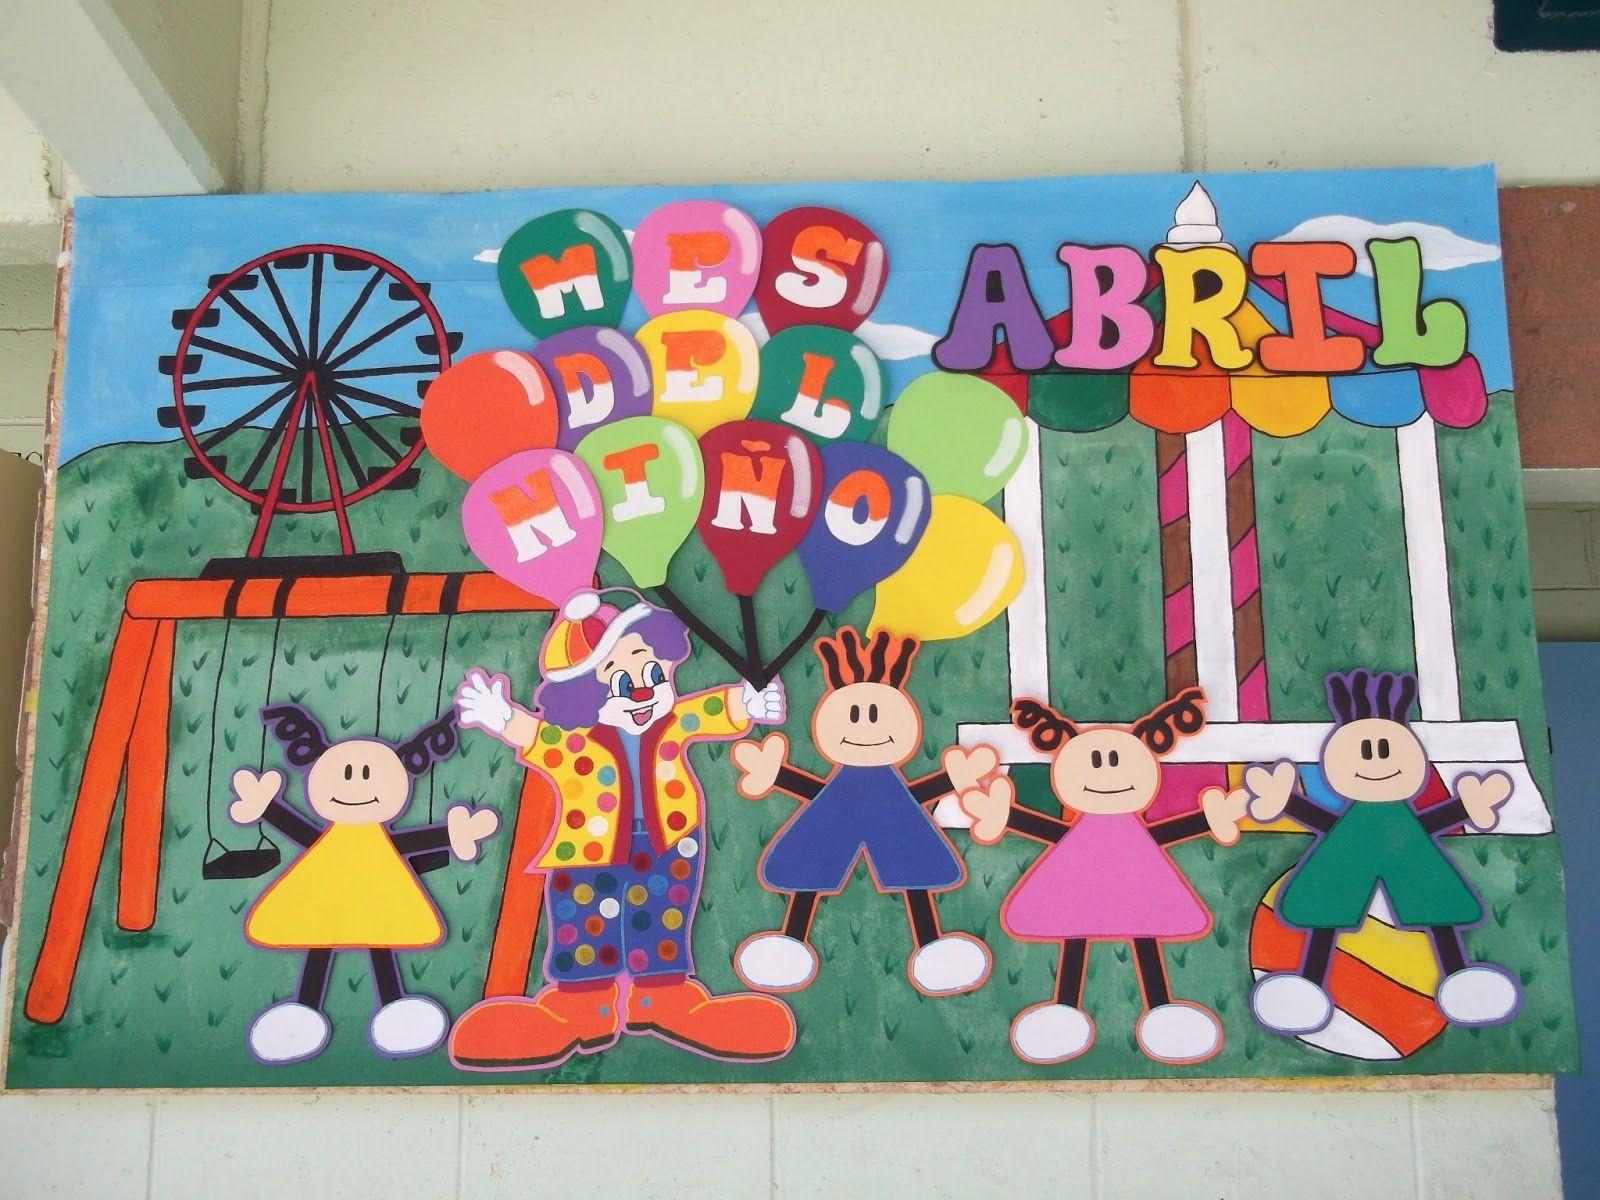 Decoraciones infantiles the teacher abril mes del ni o for Decoracion habitacion infantil nino